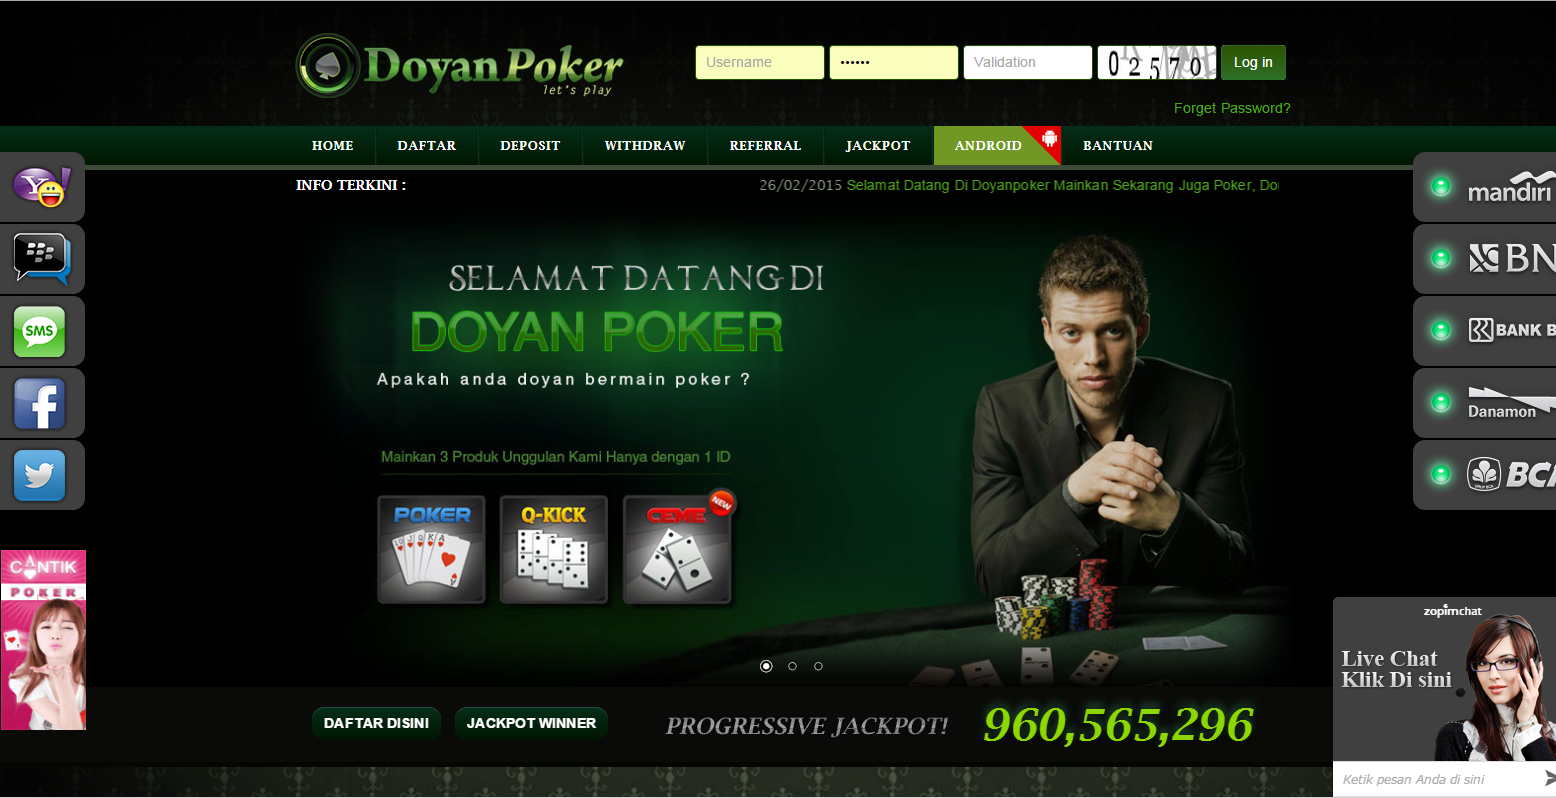 doyanpoker.com